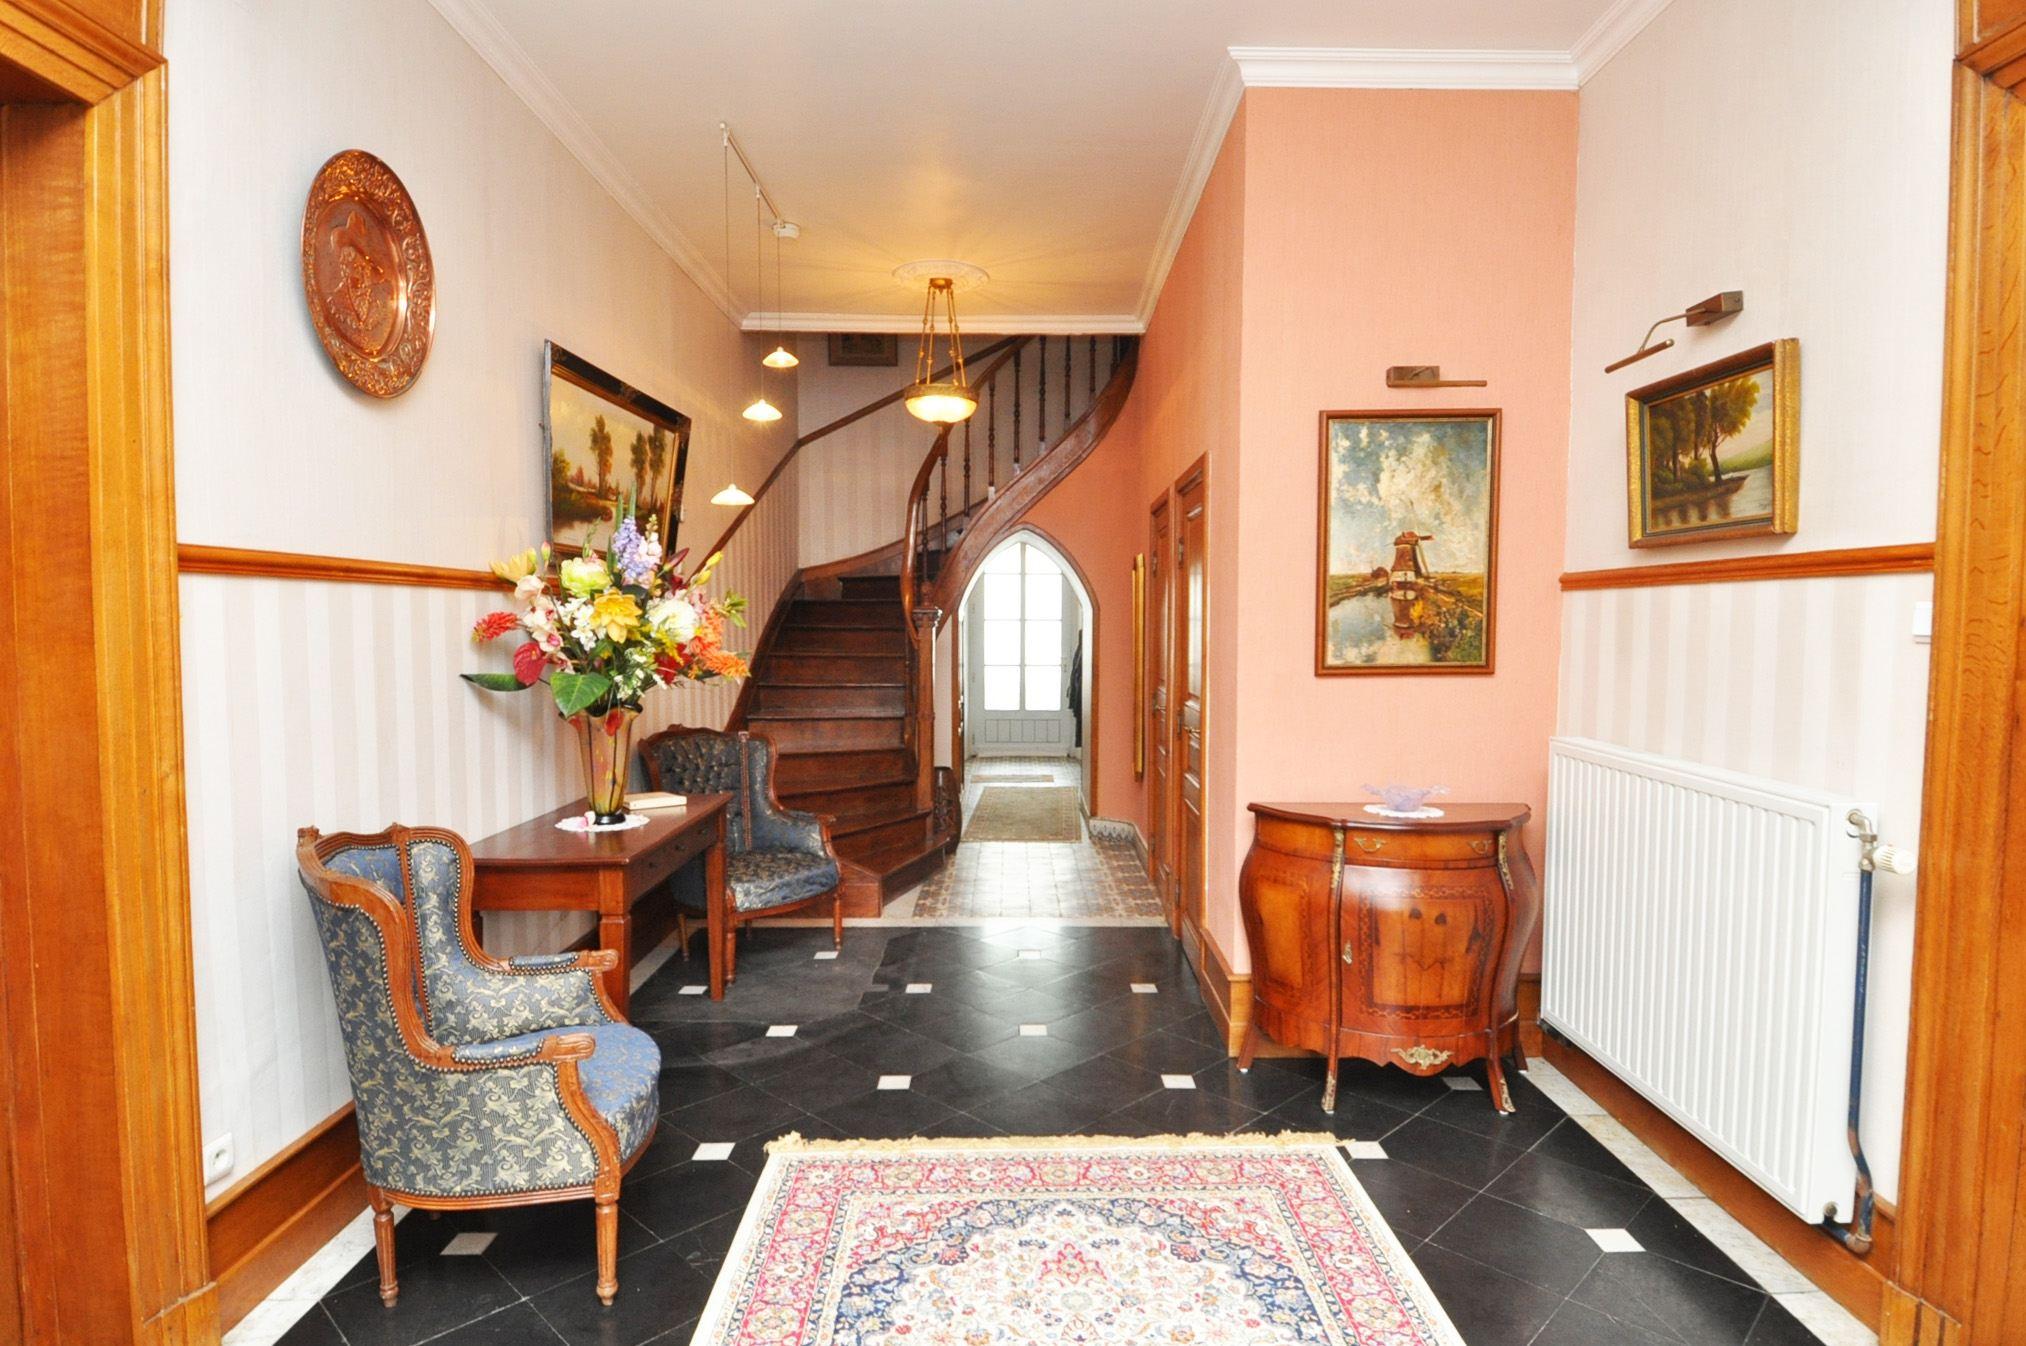 sales property at SAINS DU NORD, Wonderful Property, 510 m2 hab, 10 Ch. 1,5Ha